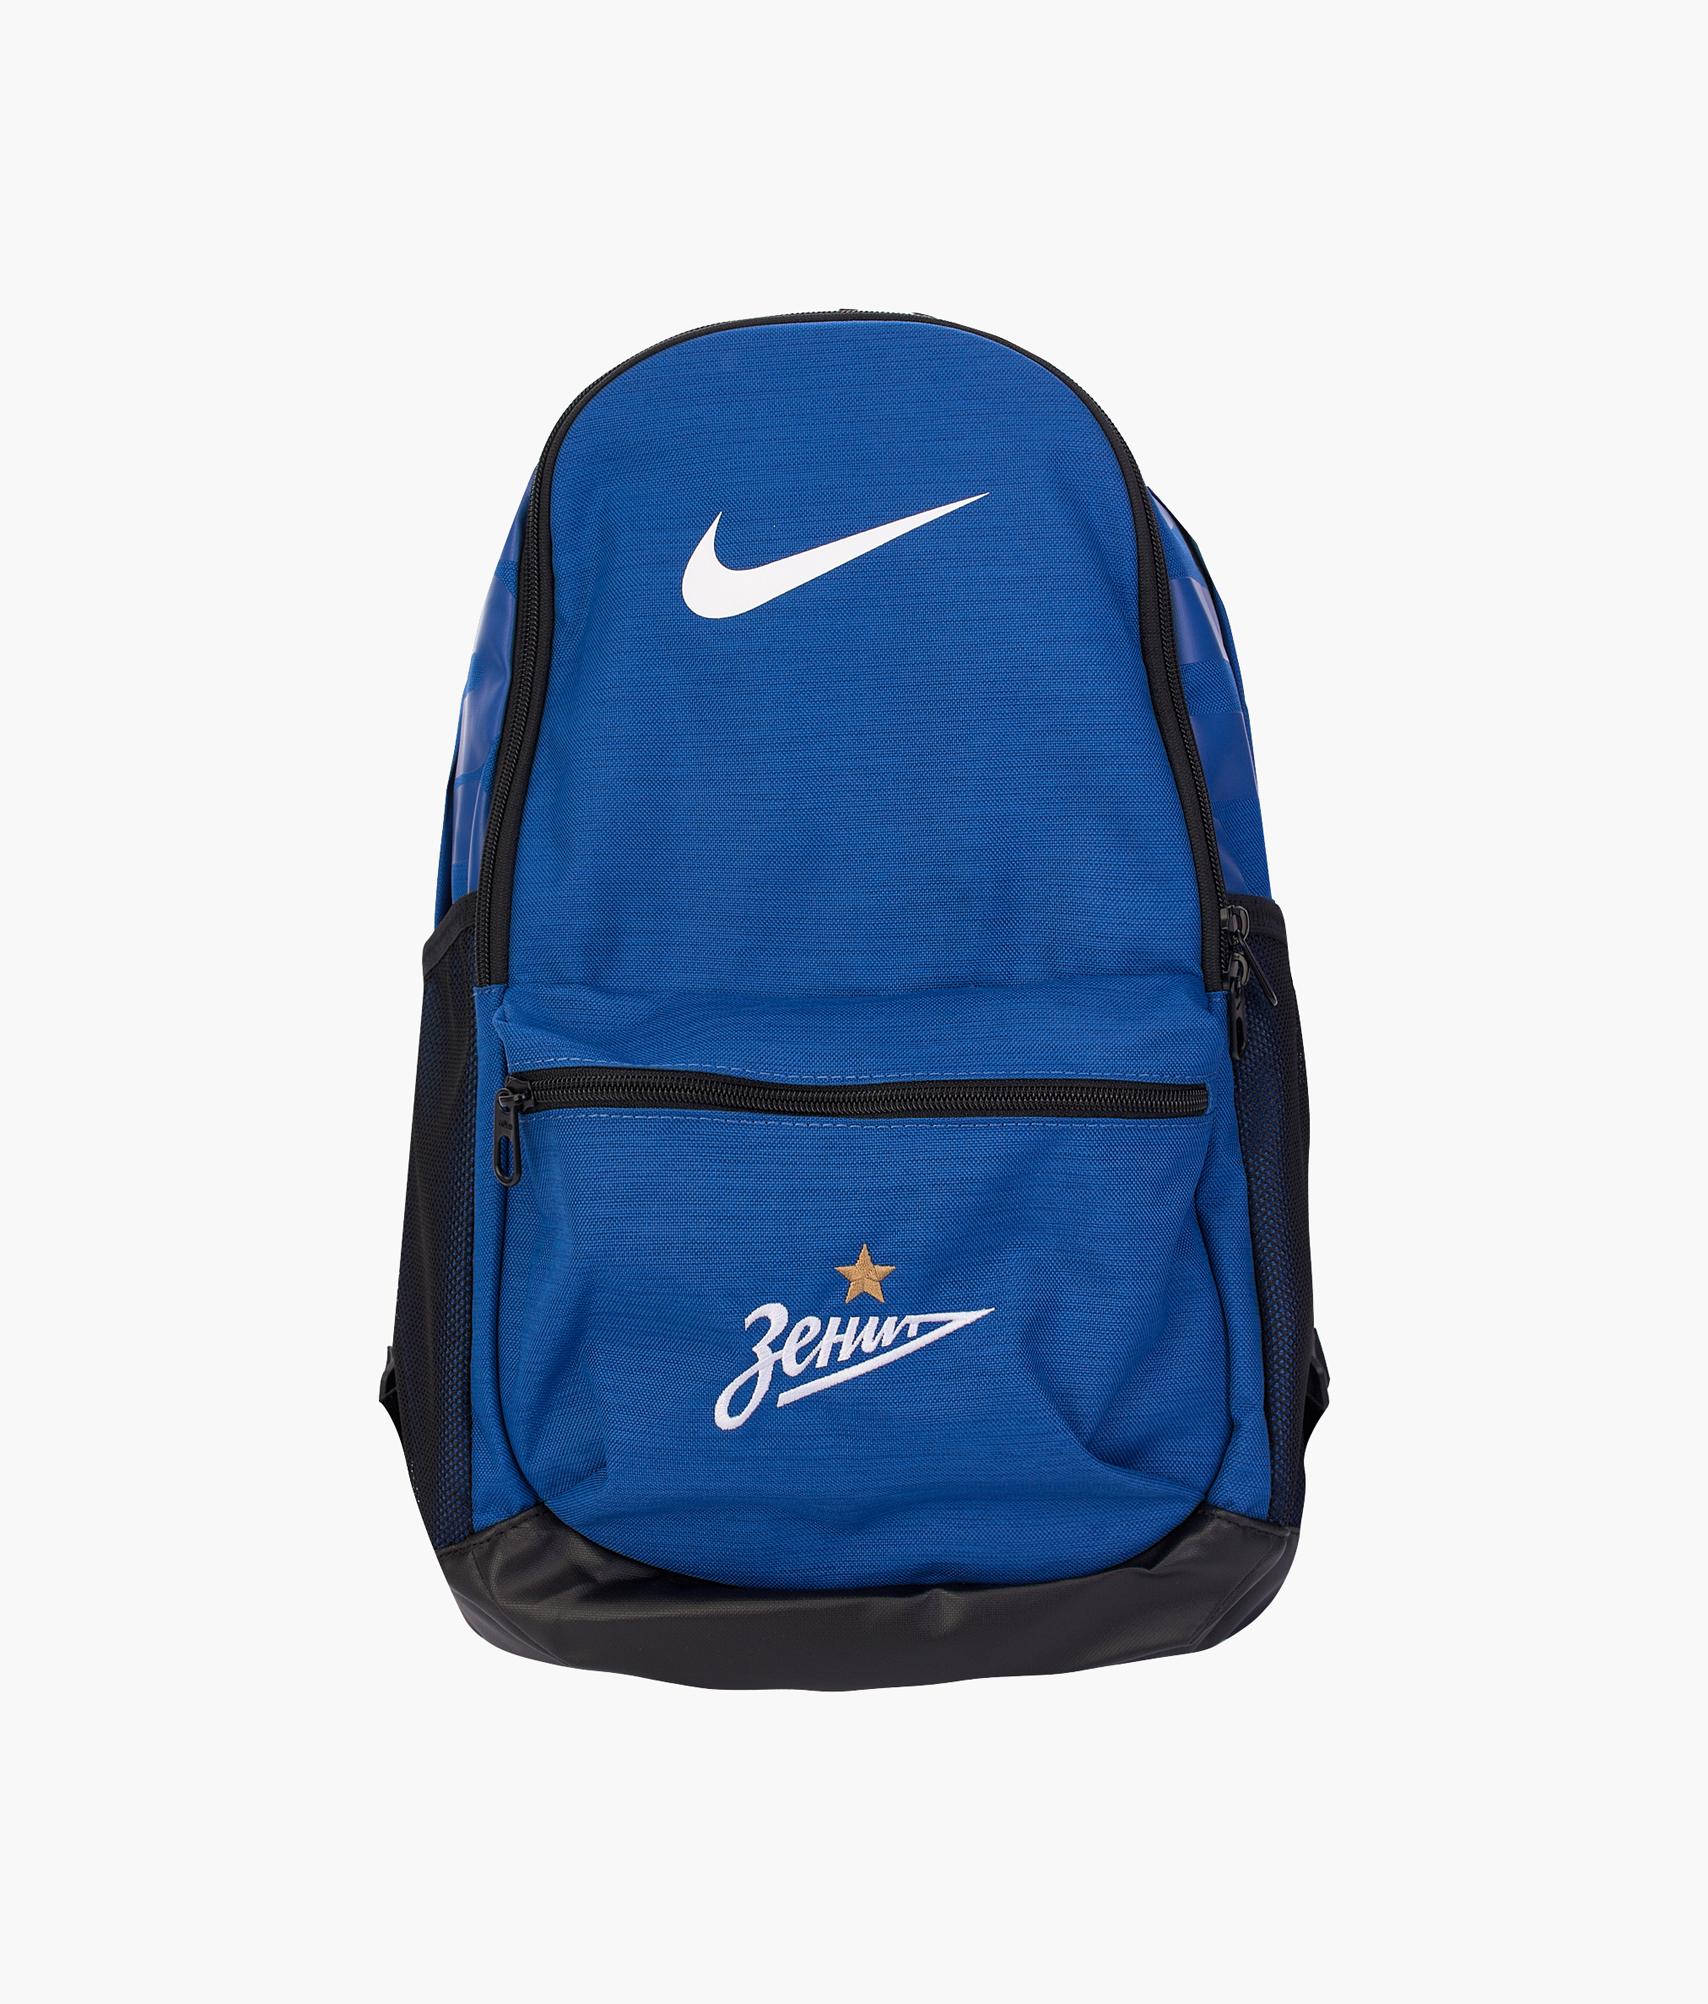 Рюкзак Nike Nike Цвет-Синий рюкзак nike nike ni464bghusy0